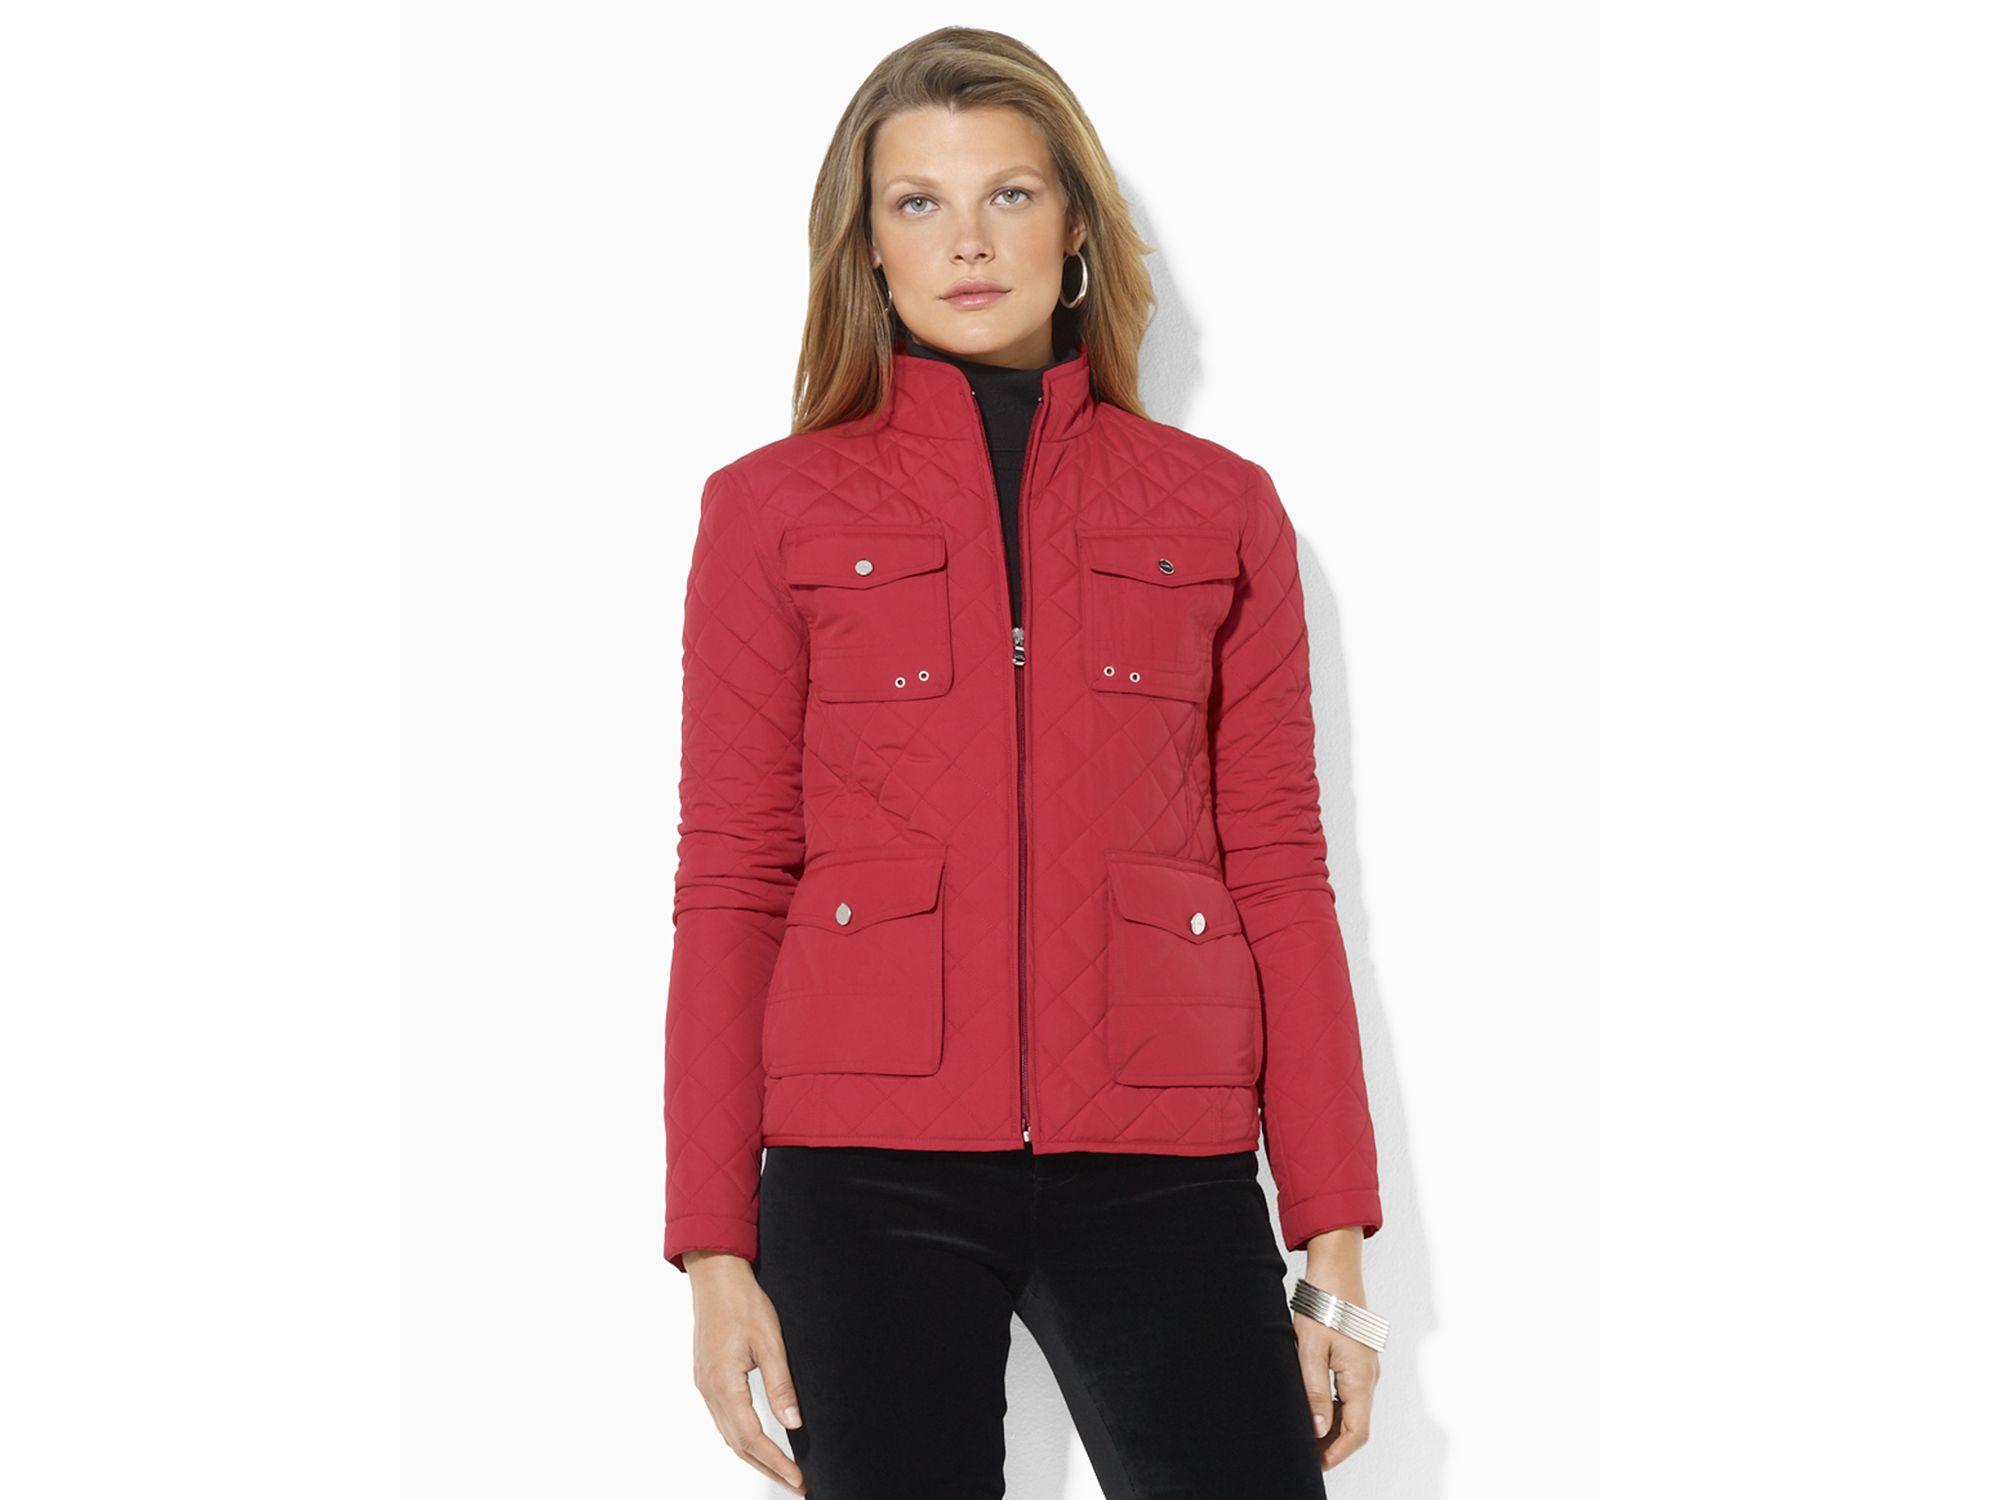 main dorrington eastern women jackets woolrich vest sports s womens barn barns mountain sediment